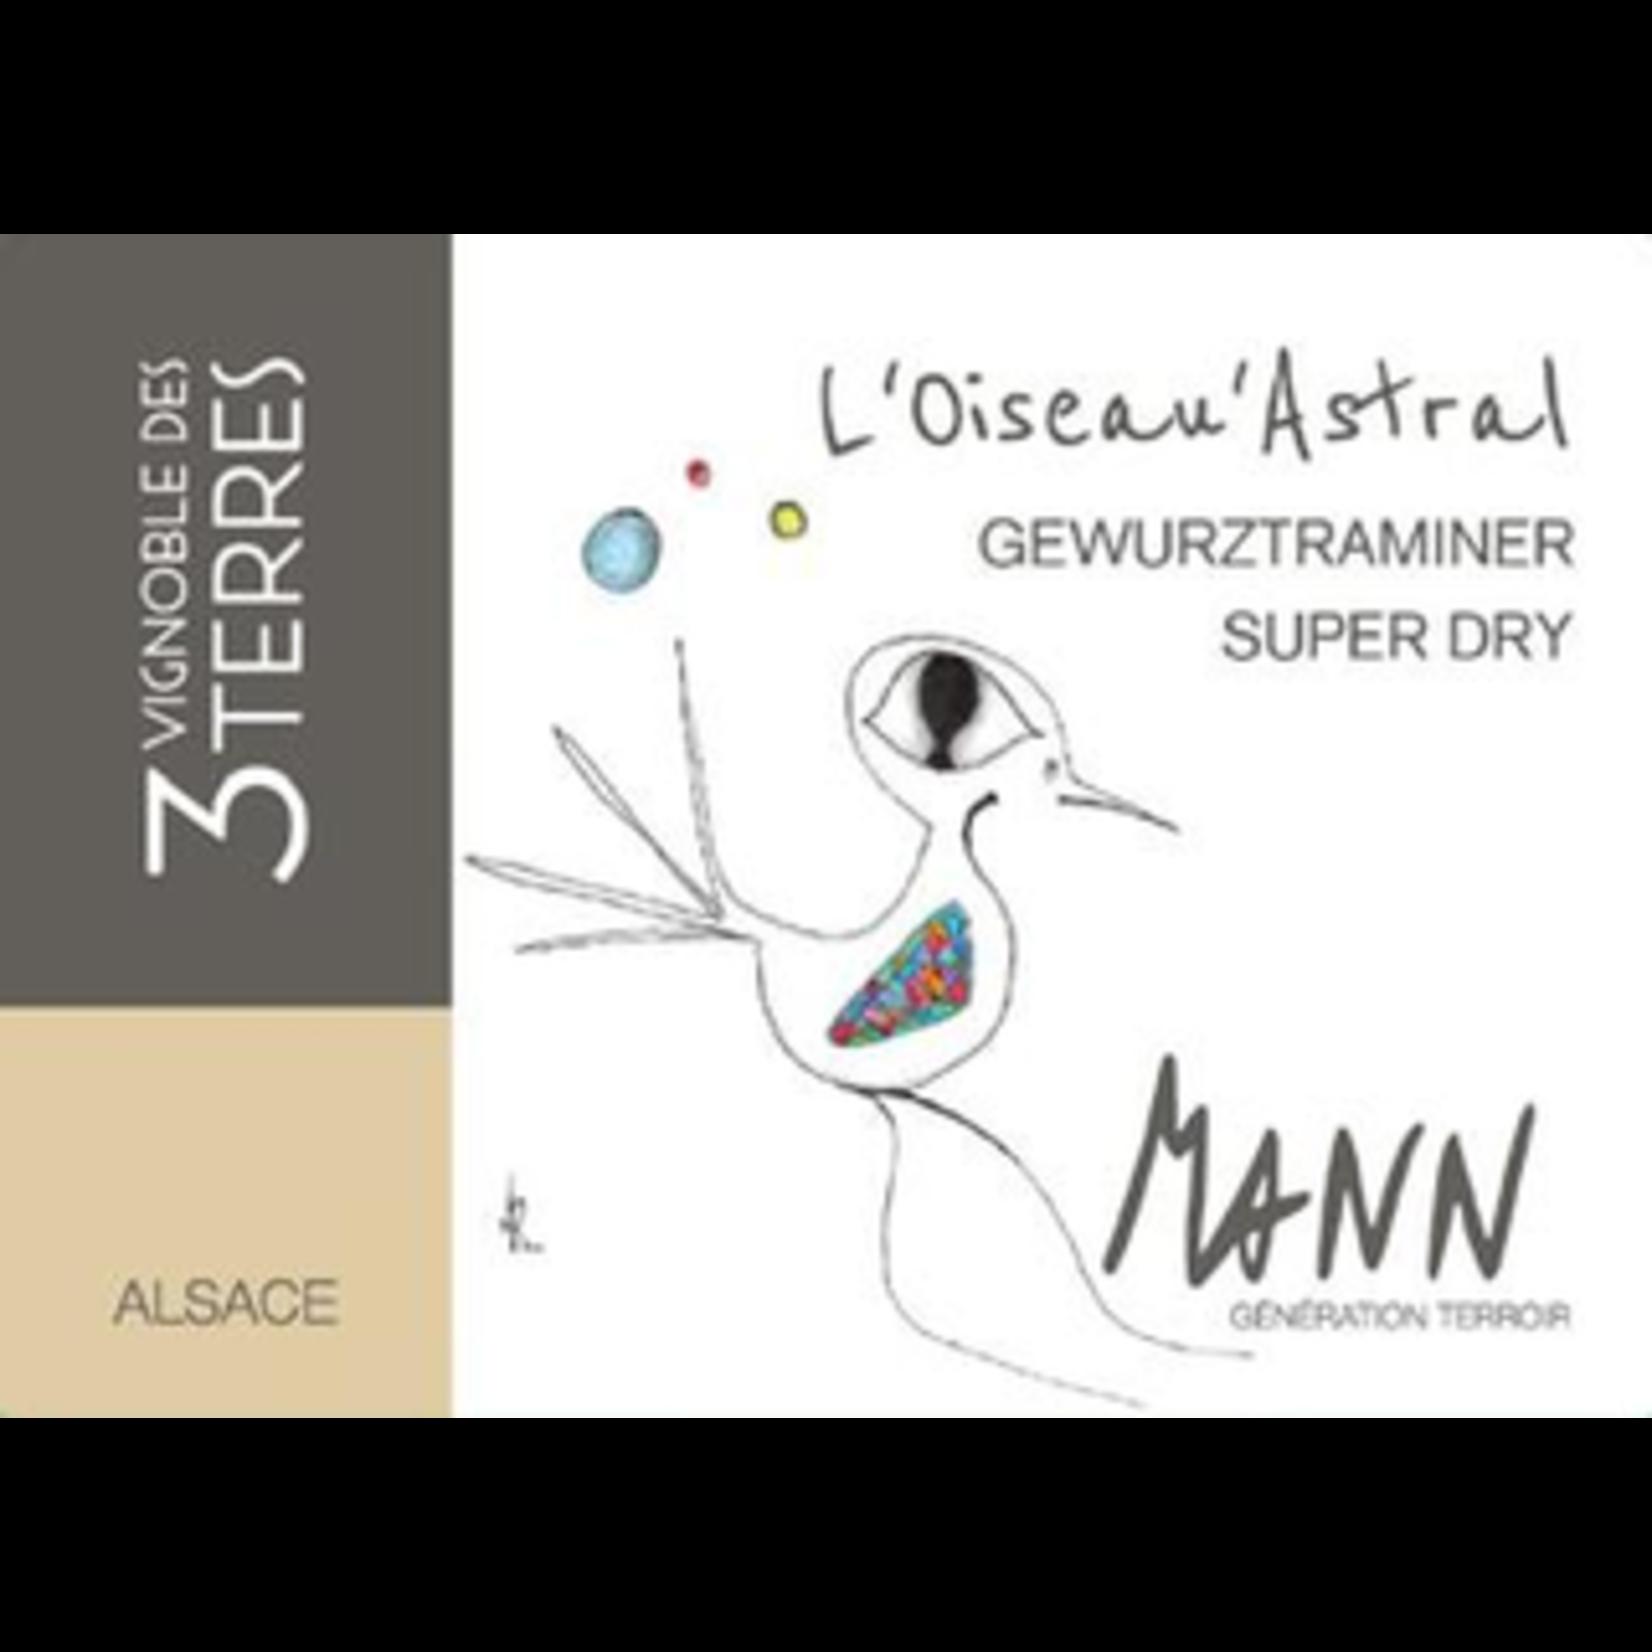 Wine DOmaine Mann Alsace Gewurztraminer L'Oiseau Astral Super Dry 2018